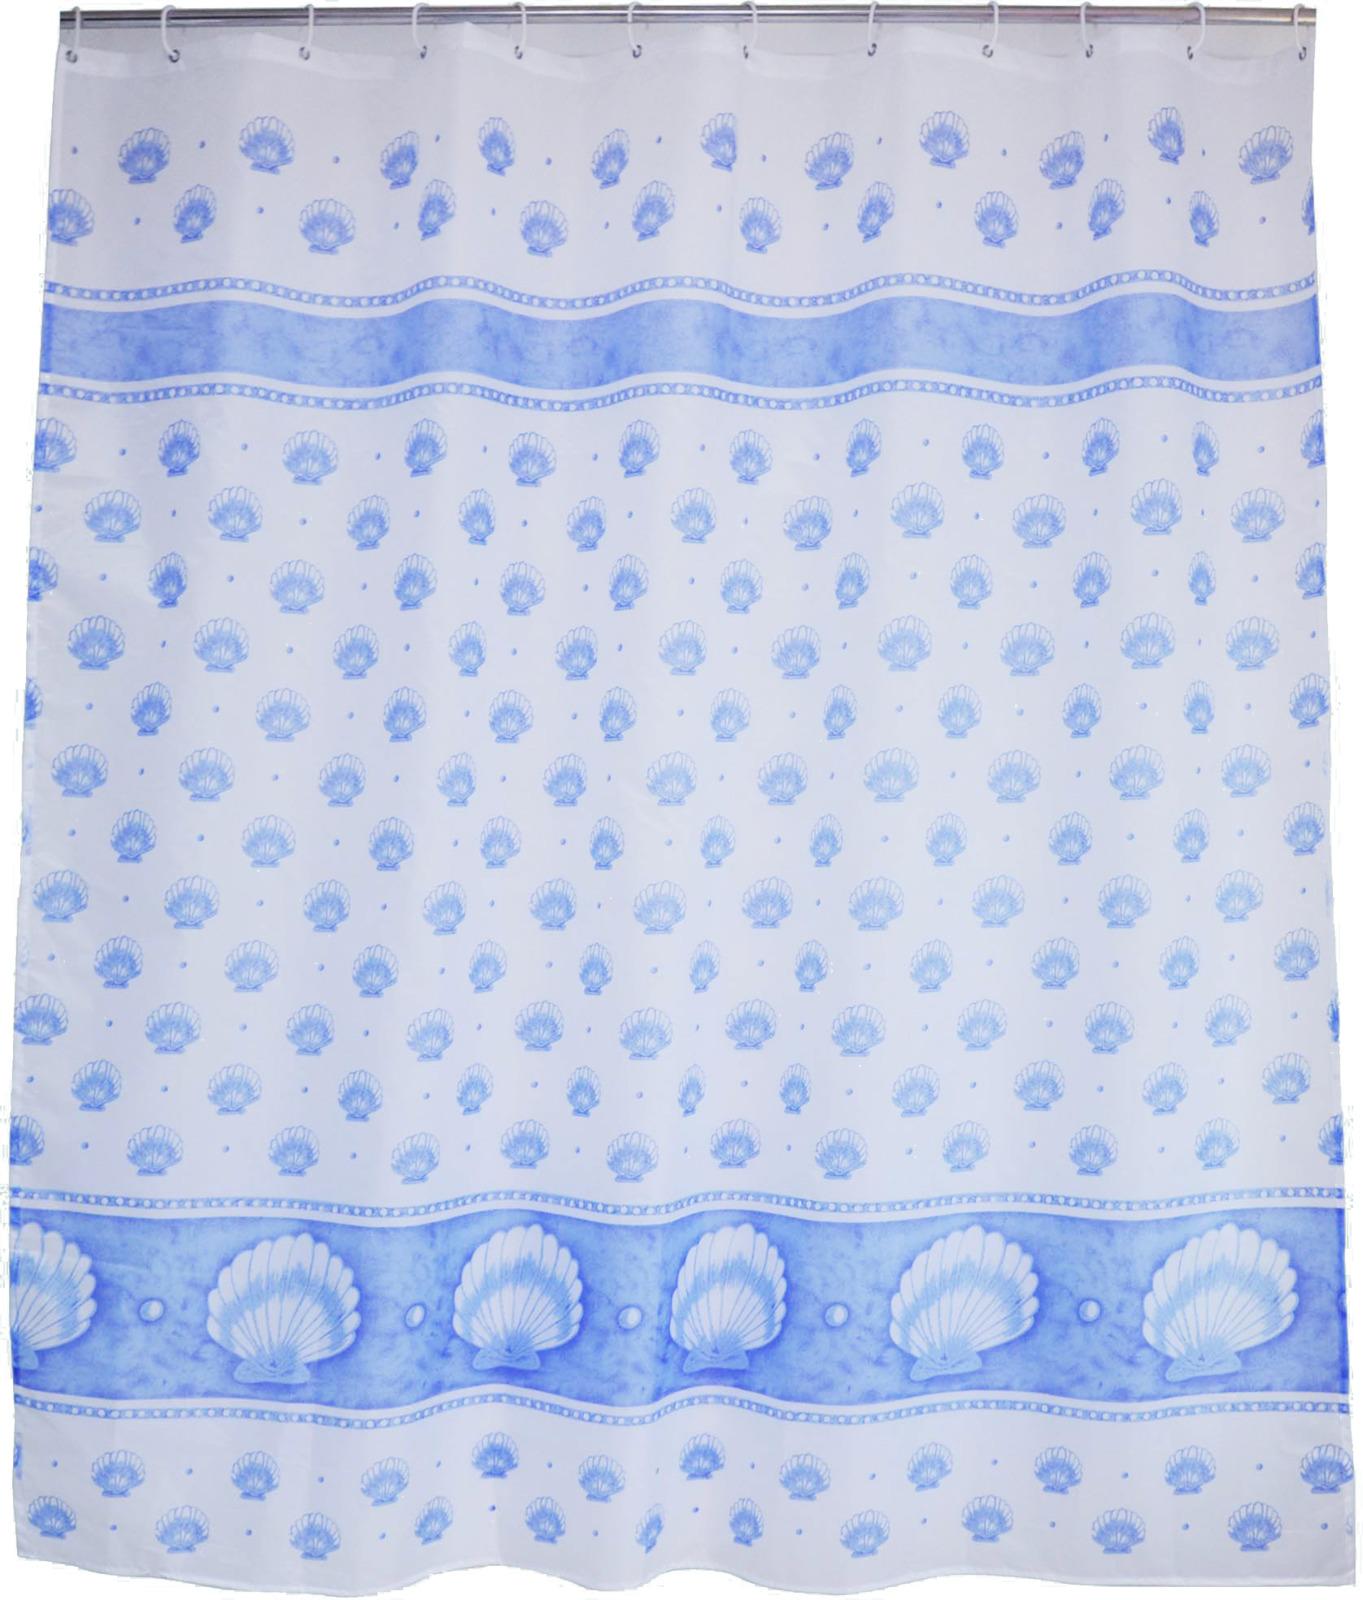 все цены на Штора для ванной Fora Голубой Жемчуг, PH69, 180 х 180 см онлайн